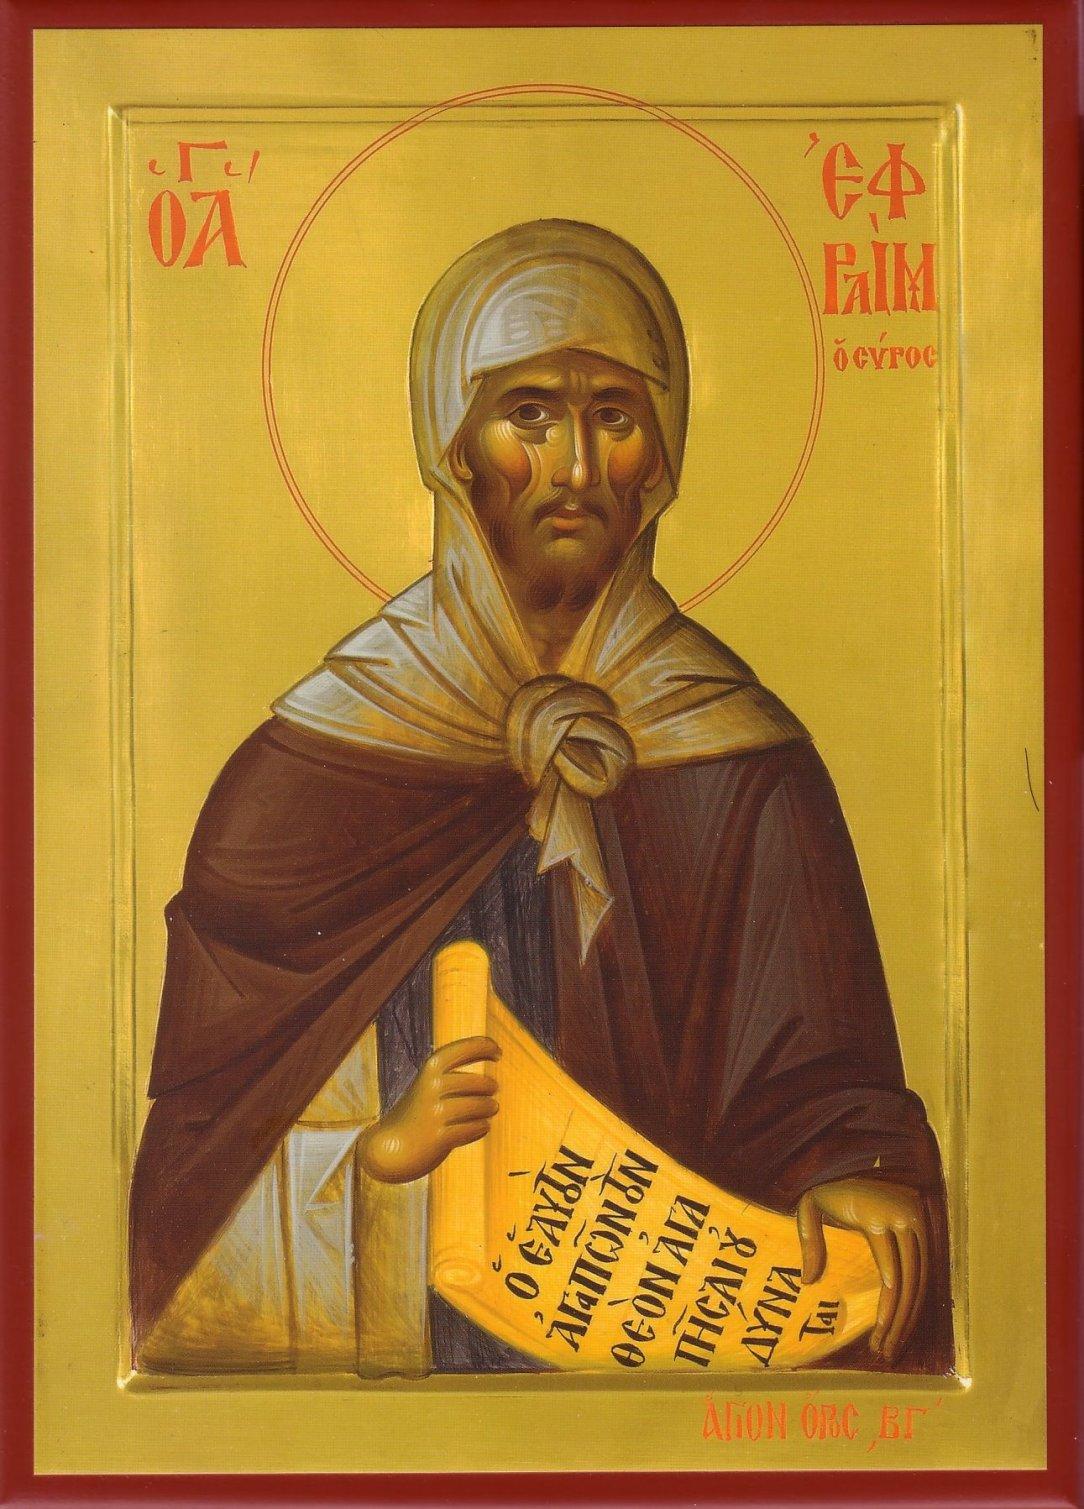 Преподобный Ефрем Сирин. Икона